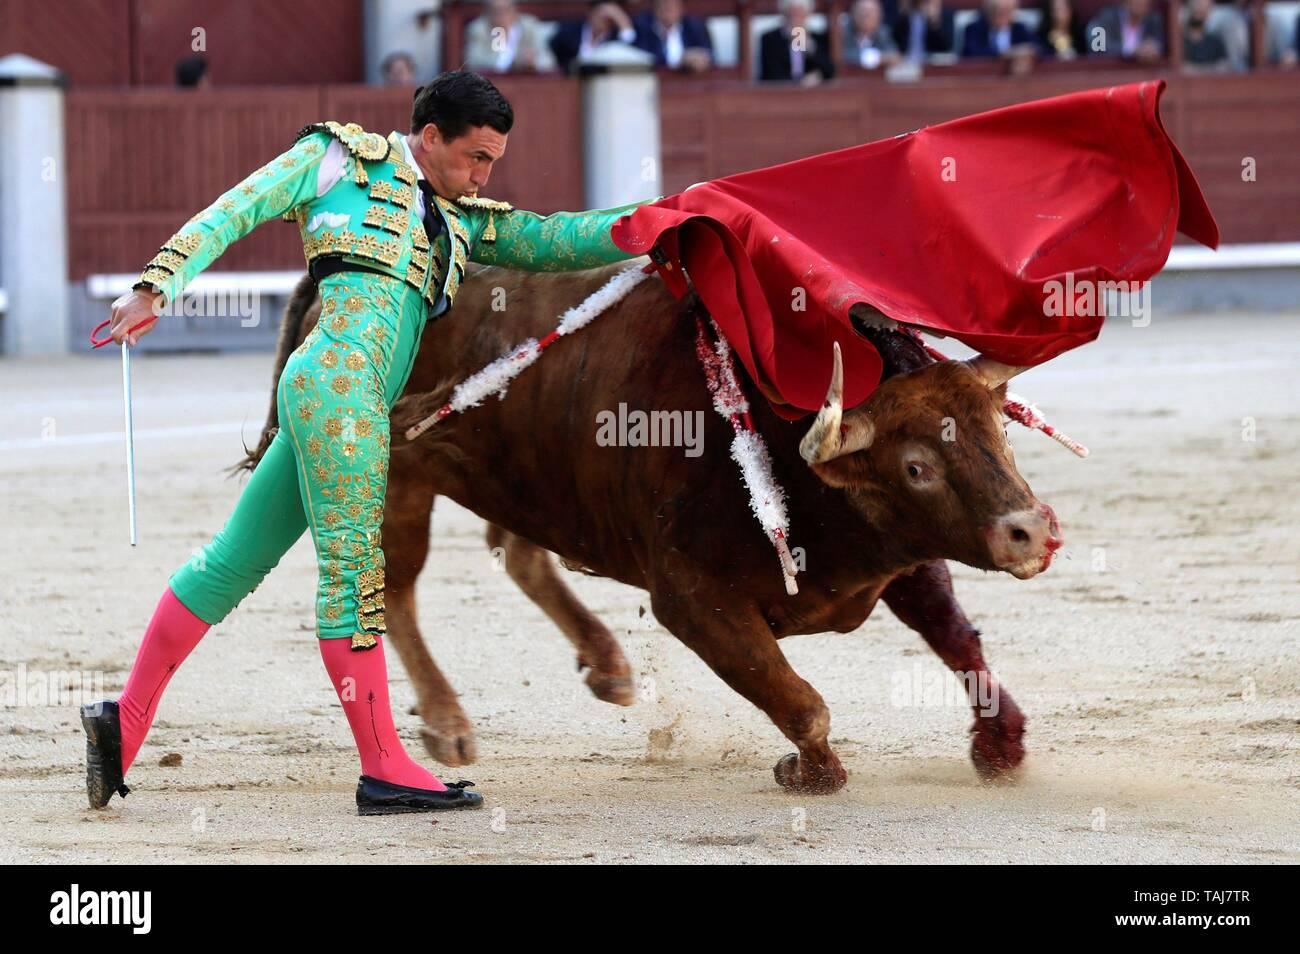 Madrid, Spain  25th May, 2019  Spanish bullfighter Octavio Chacon